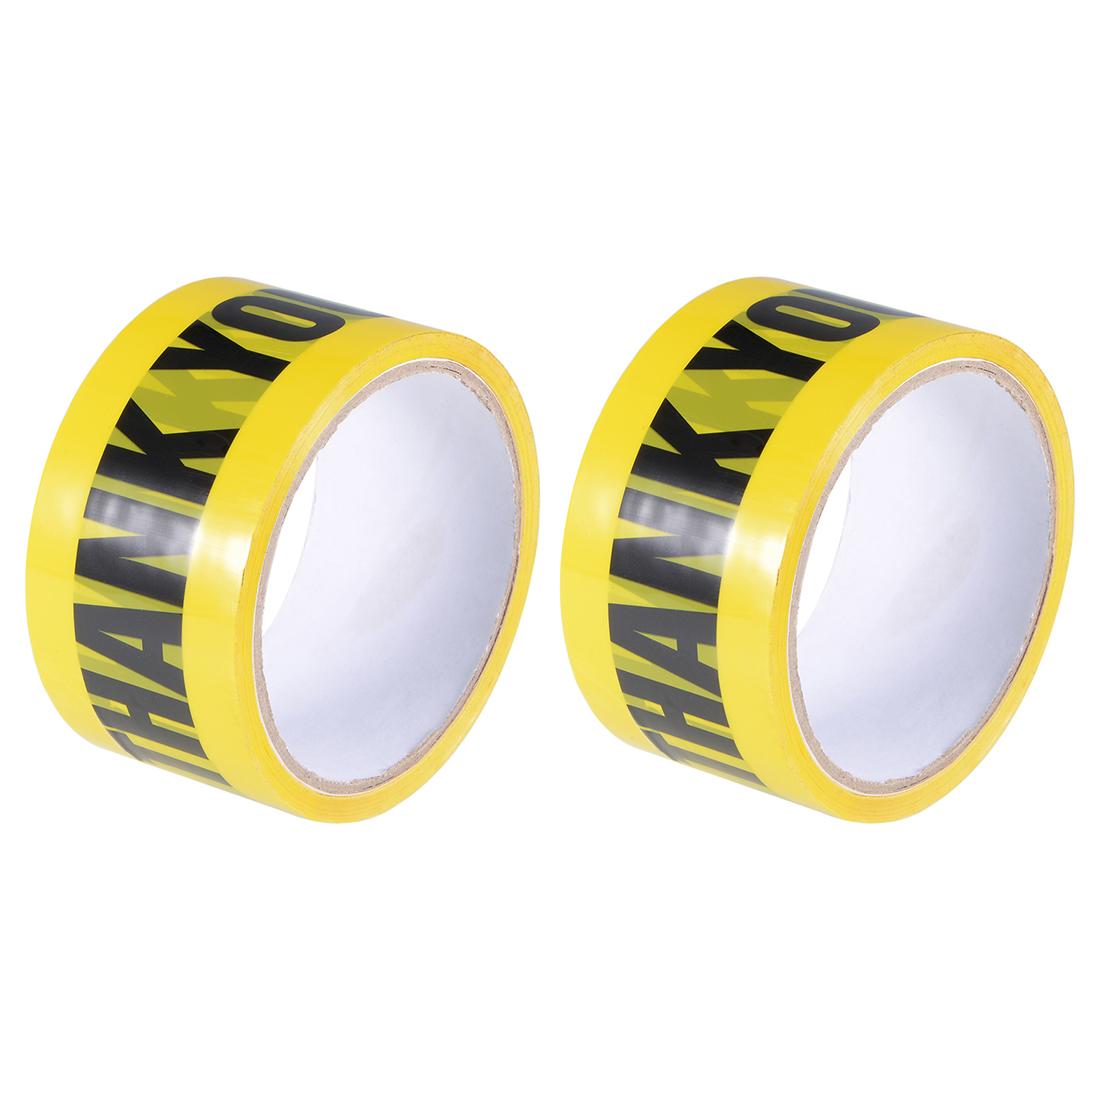 Warning Adhesive Tape Bold THANK YOU Marking, 82 Ft x 2 Inch, Yellow Black 2Pcs